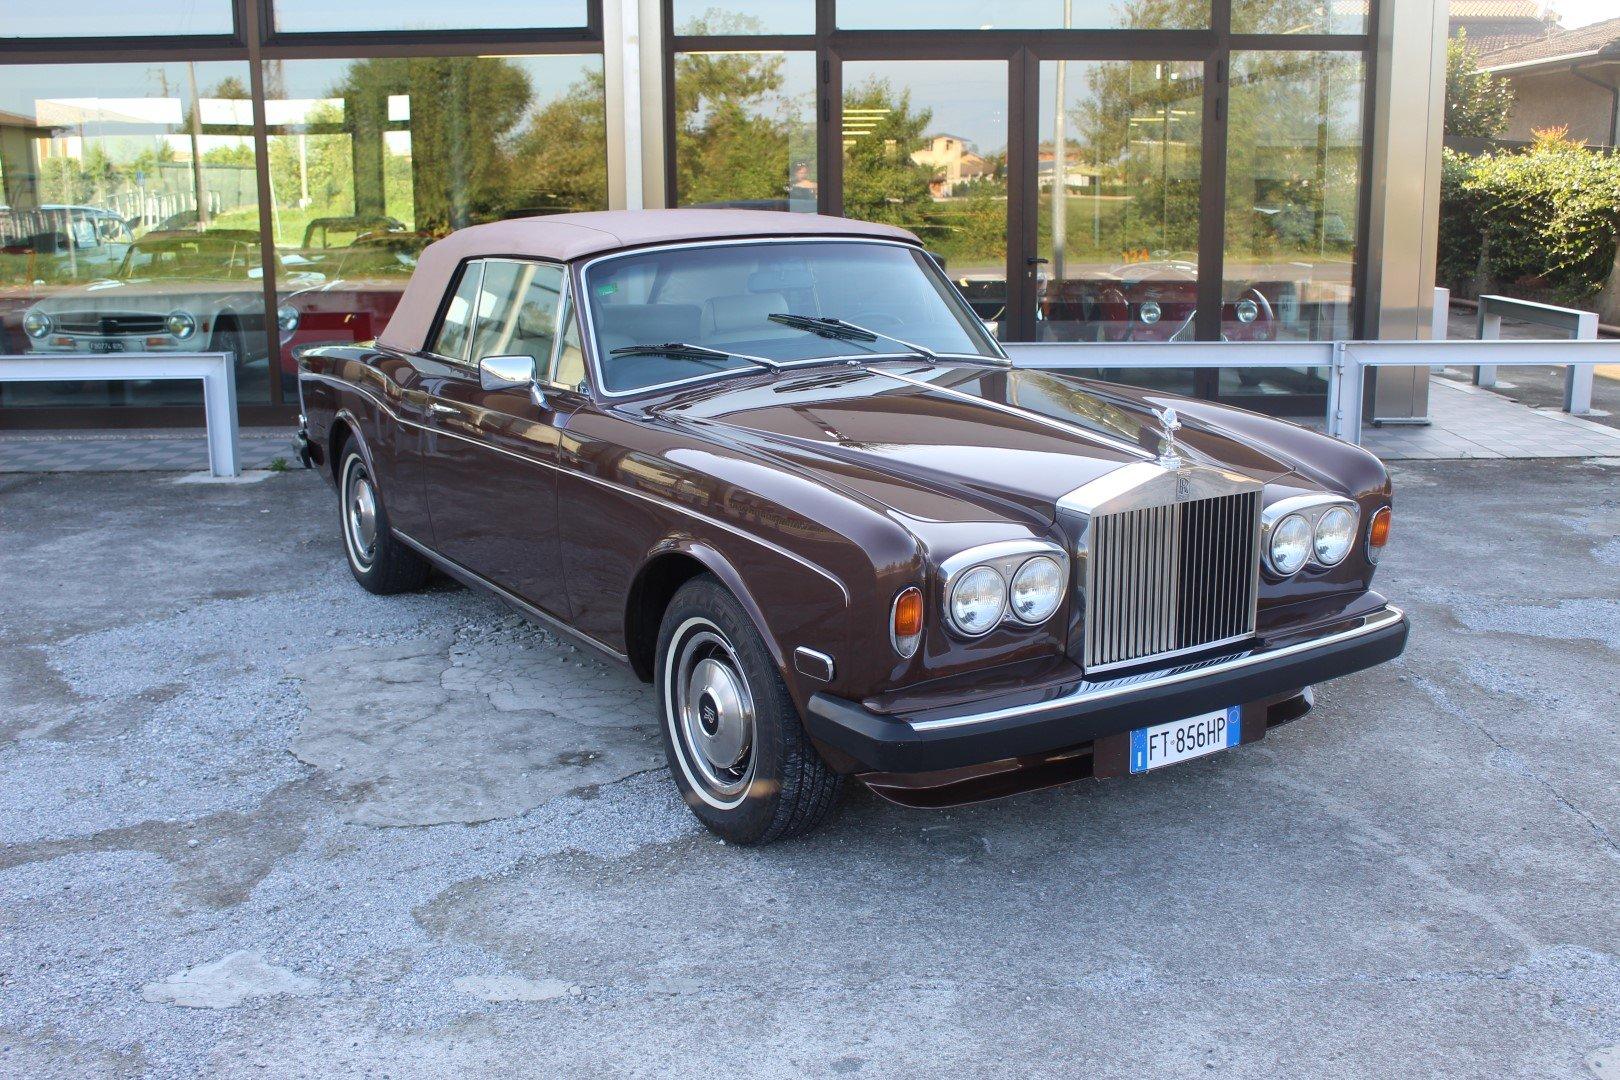 1977 Rolls royce corniche ii convertible lhd european For Sale (picture 1 of 6)